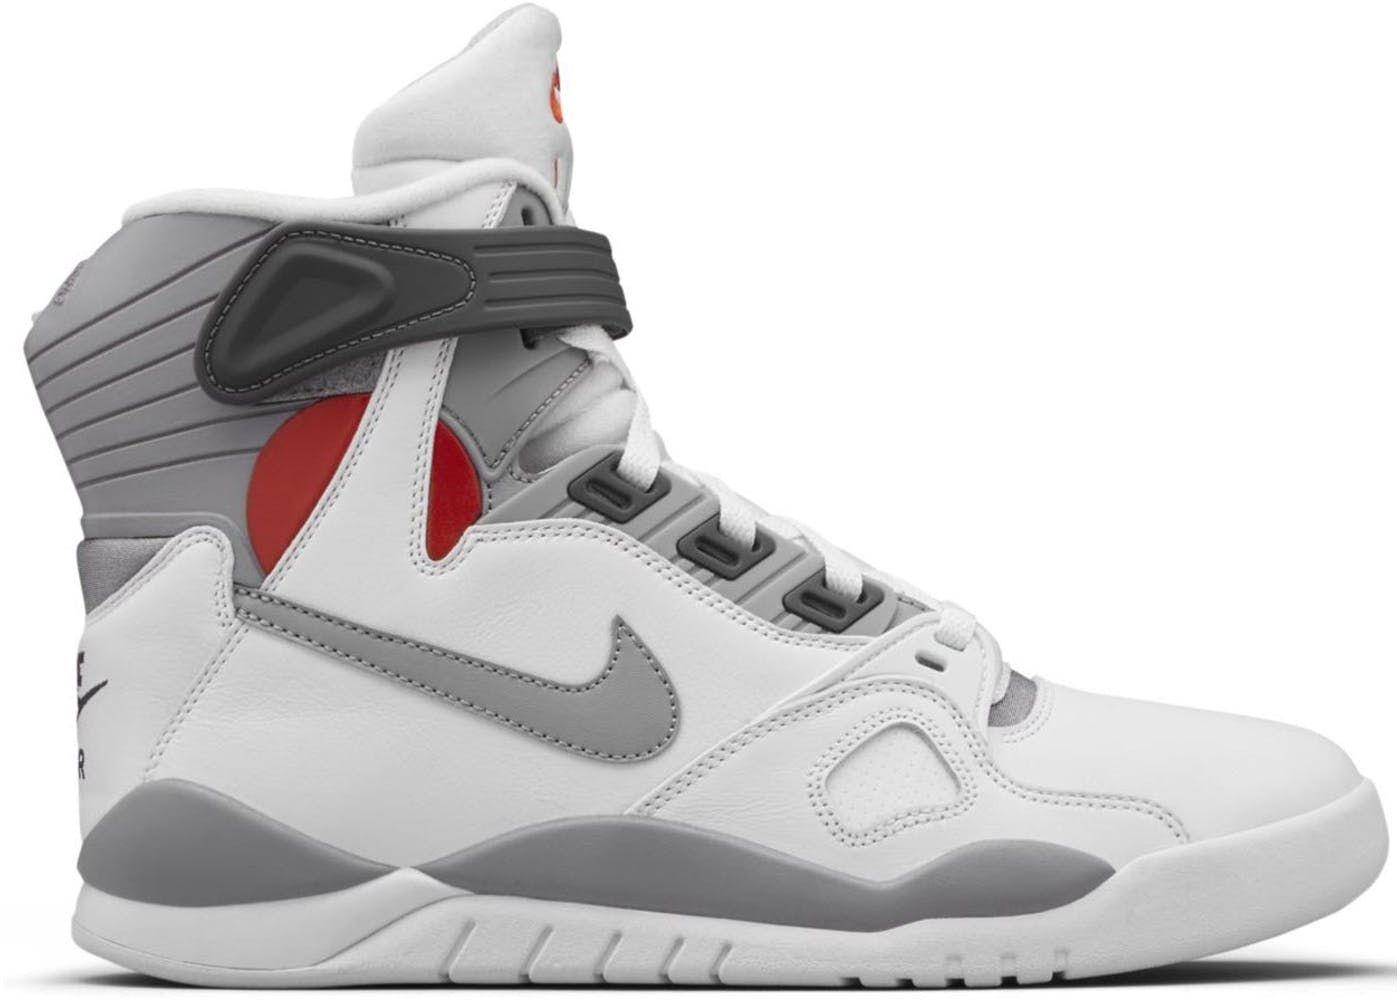 Nike Air Pressure Retro White Cement